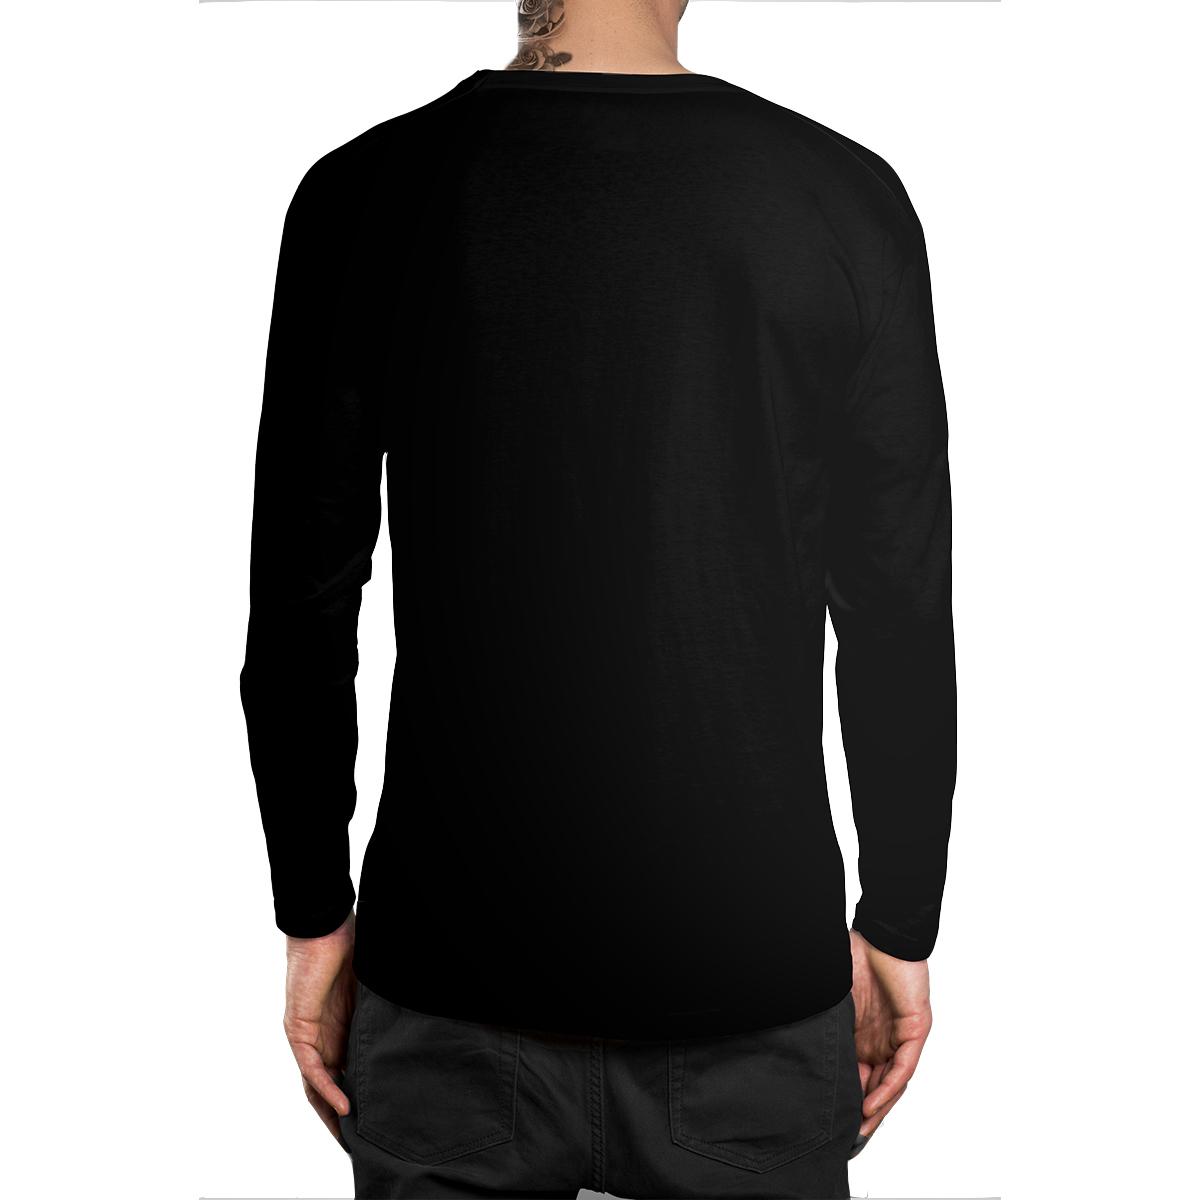 Stompy Camiseta Manga Longa Modelo 53